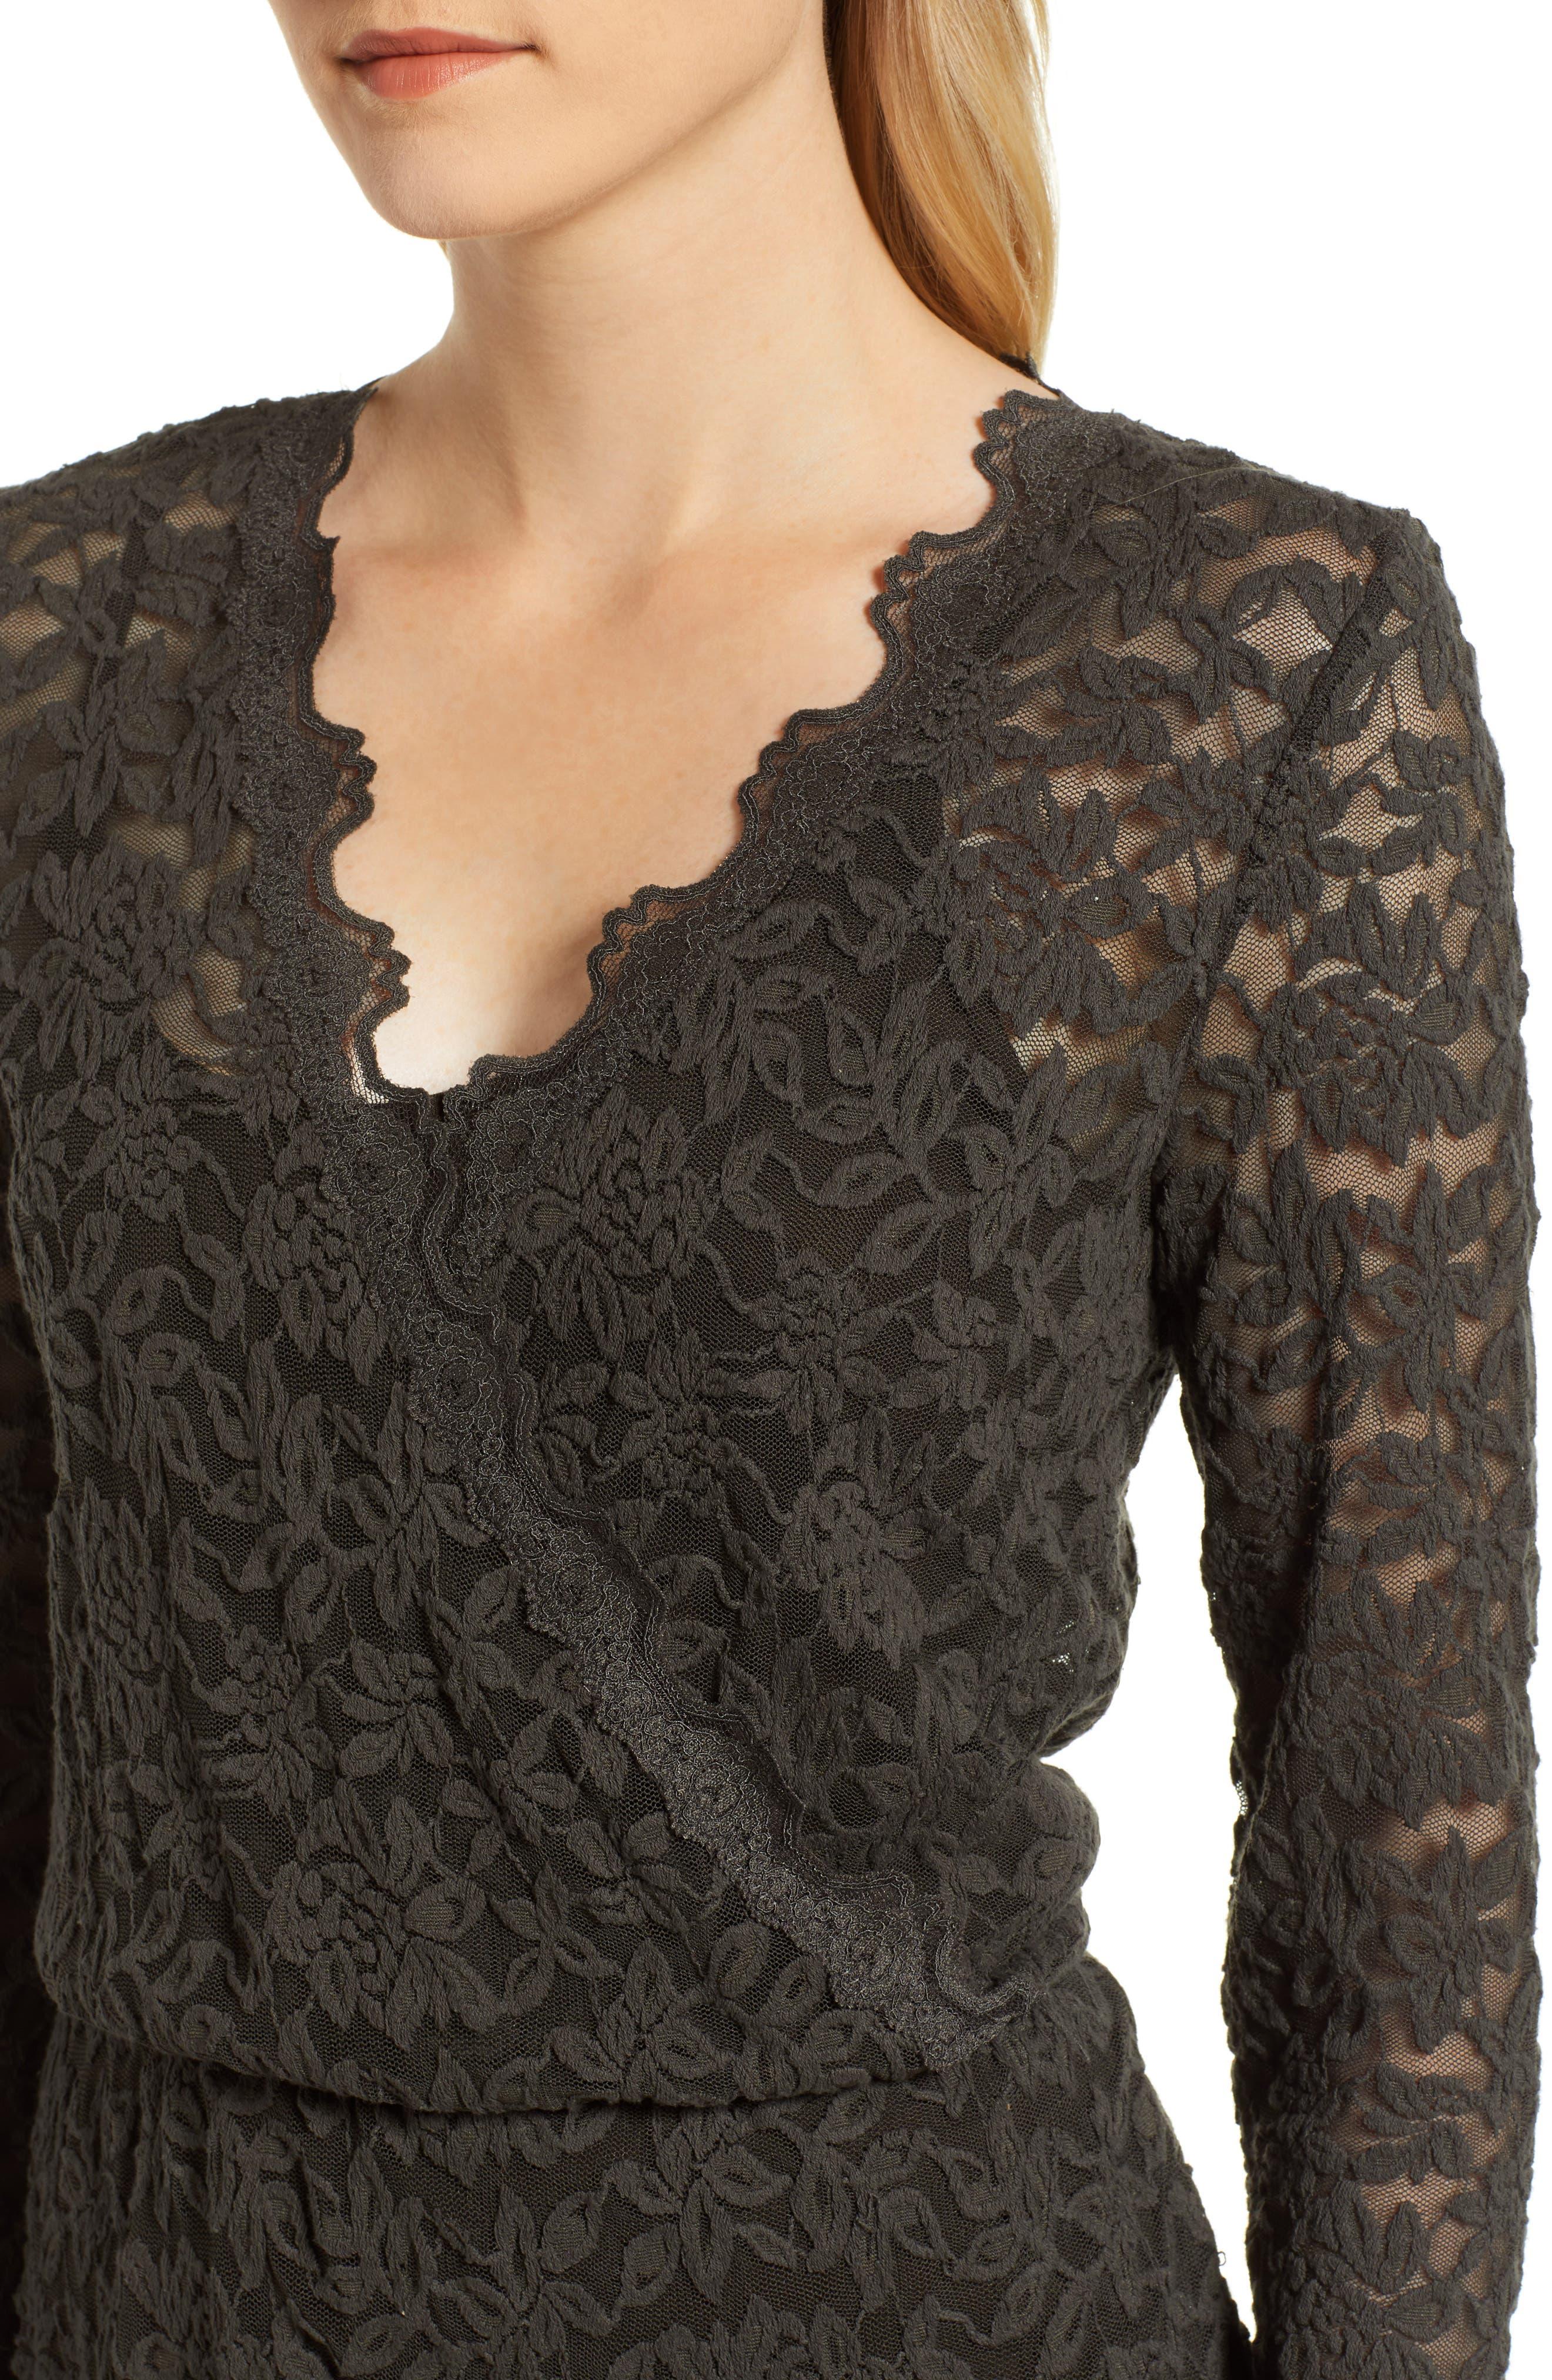 ROSEMUNDE, Delicia Scallop Detail Cotton Blend Lace Dress, Alternate thumbnail 5, color, DARK FOREST